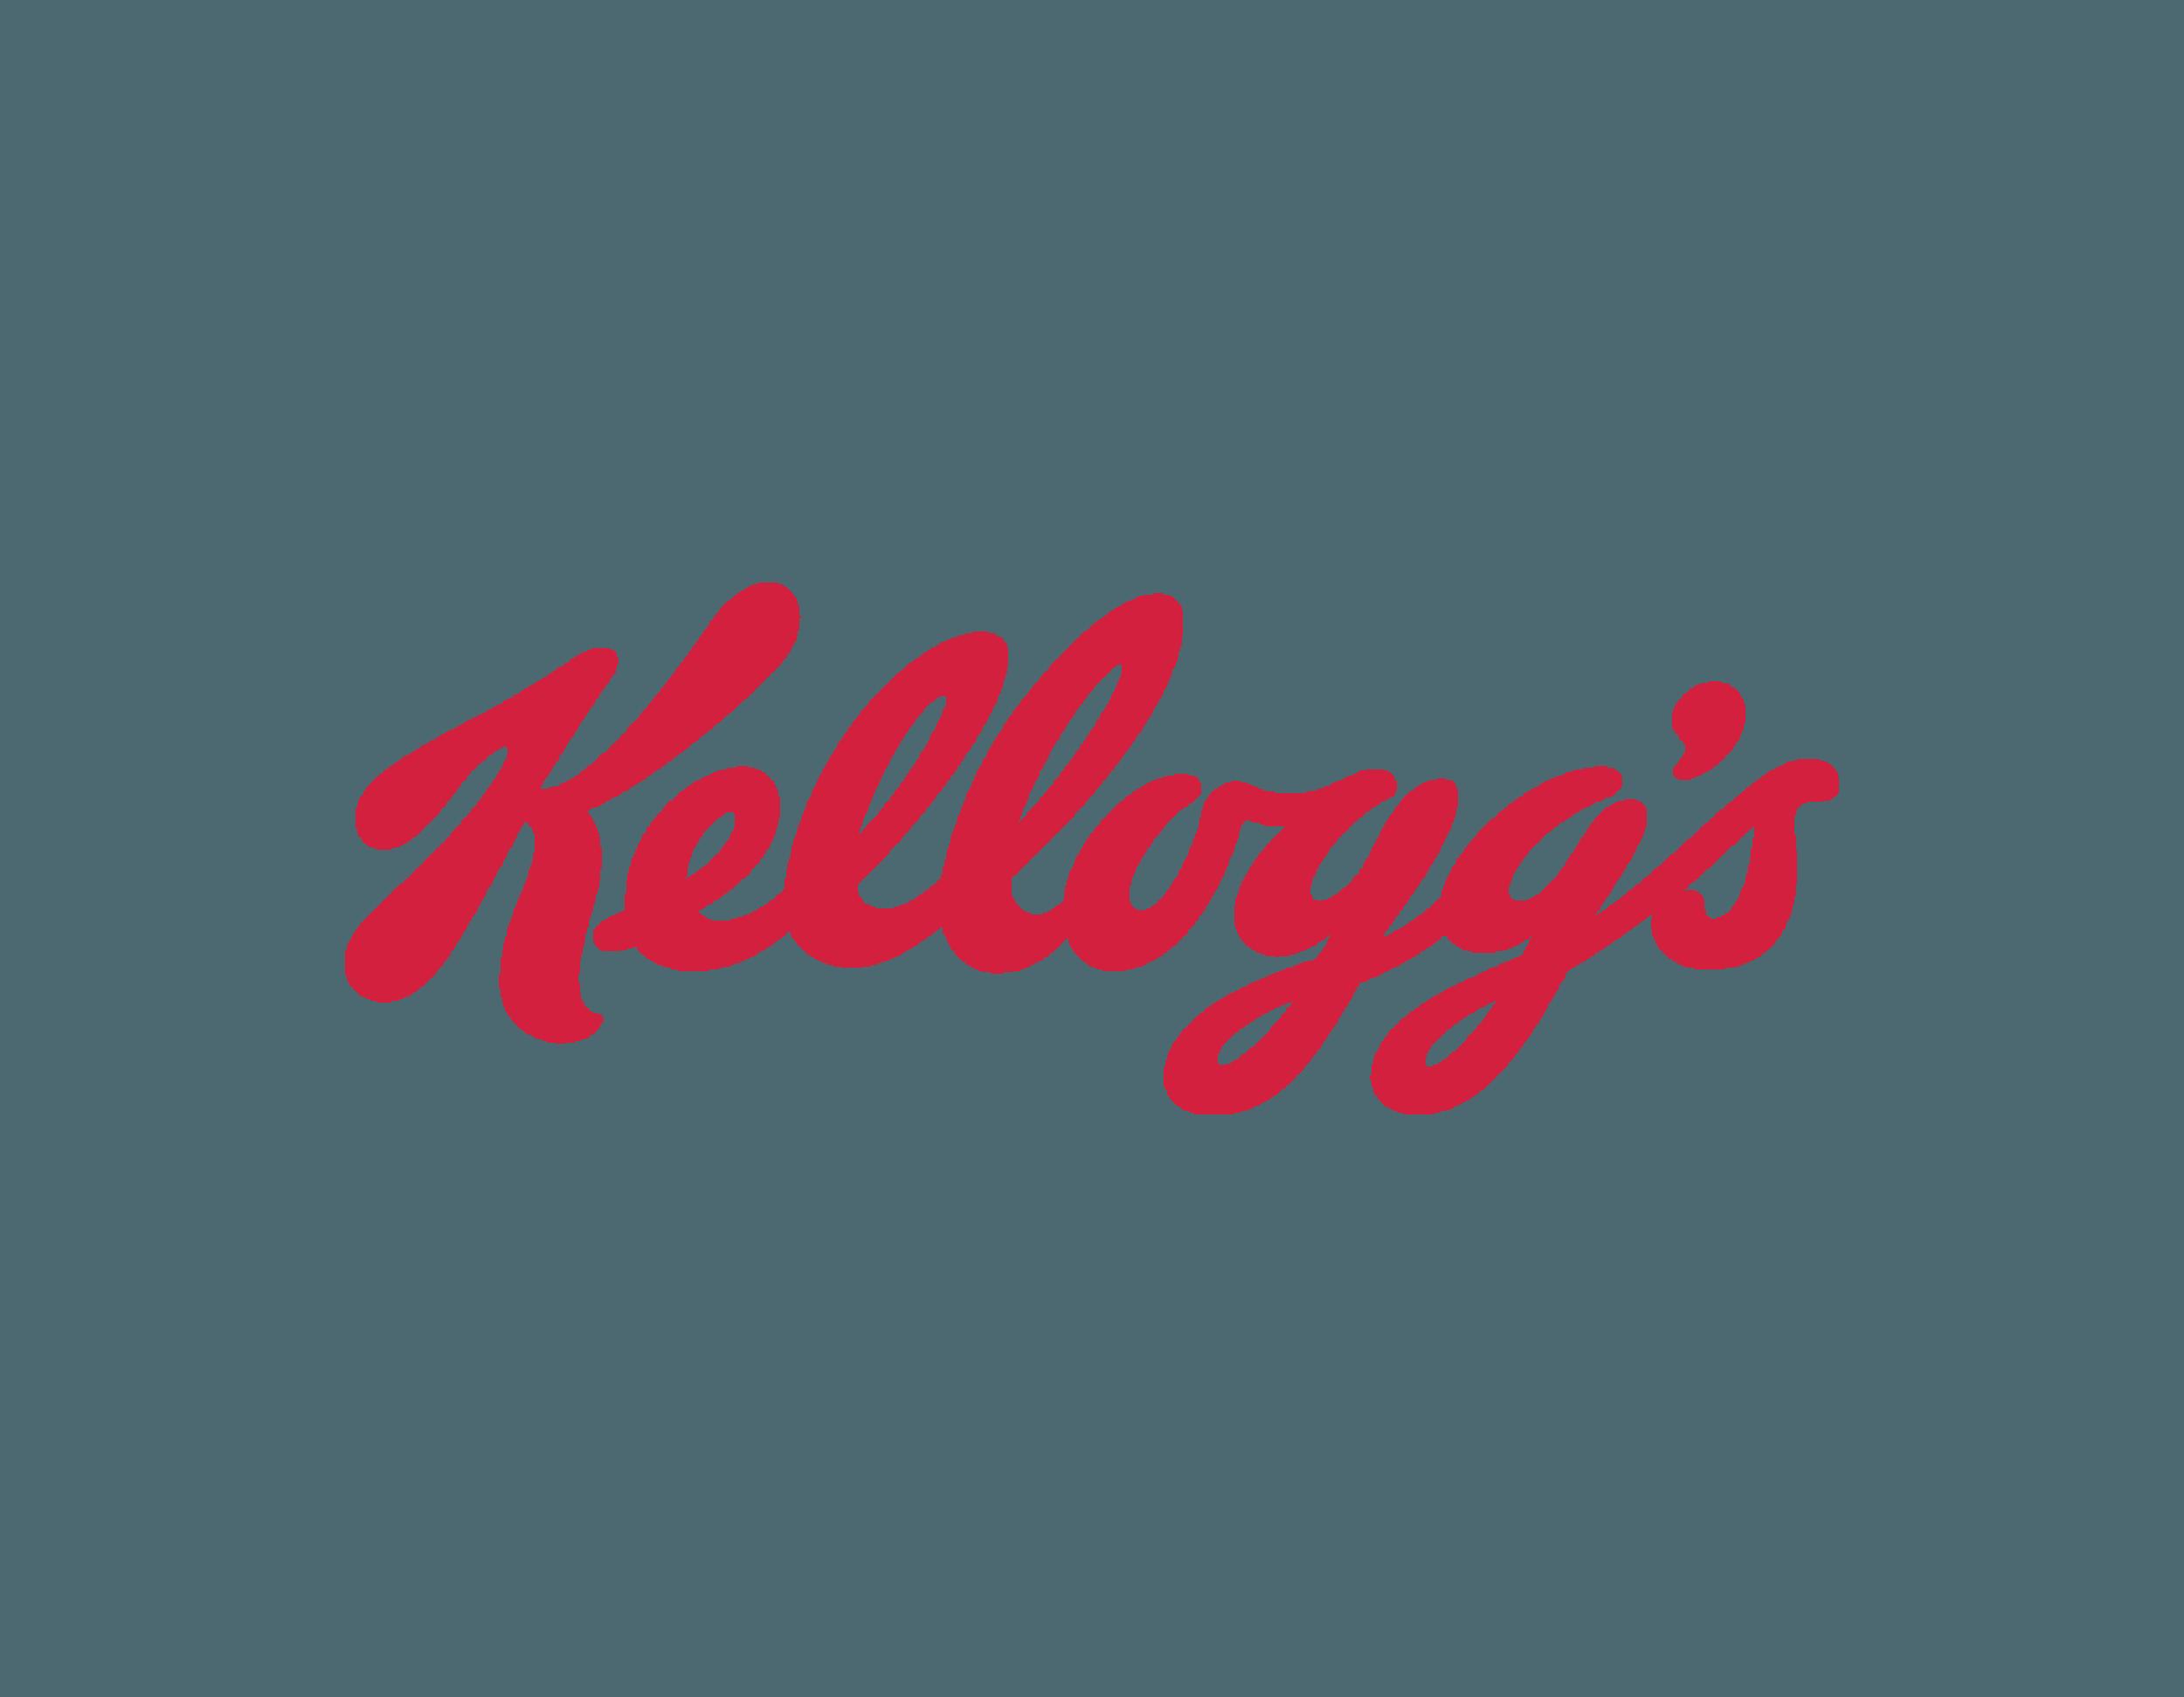 Kellogg's@300x-8.png